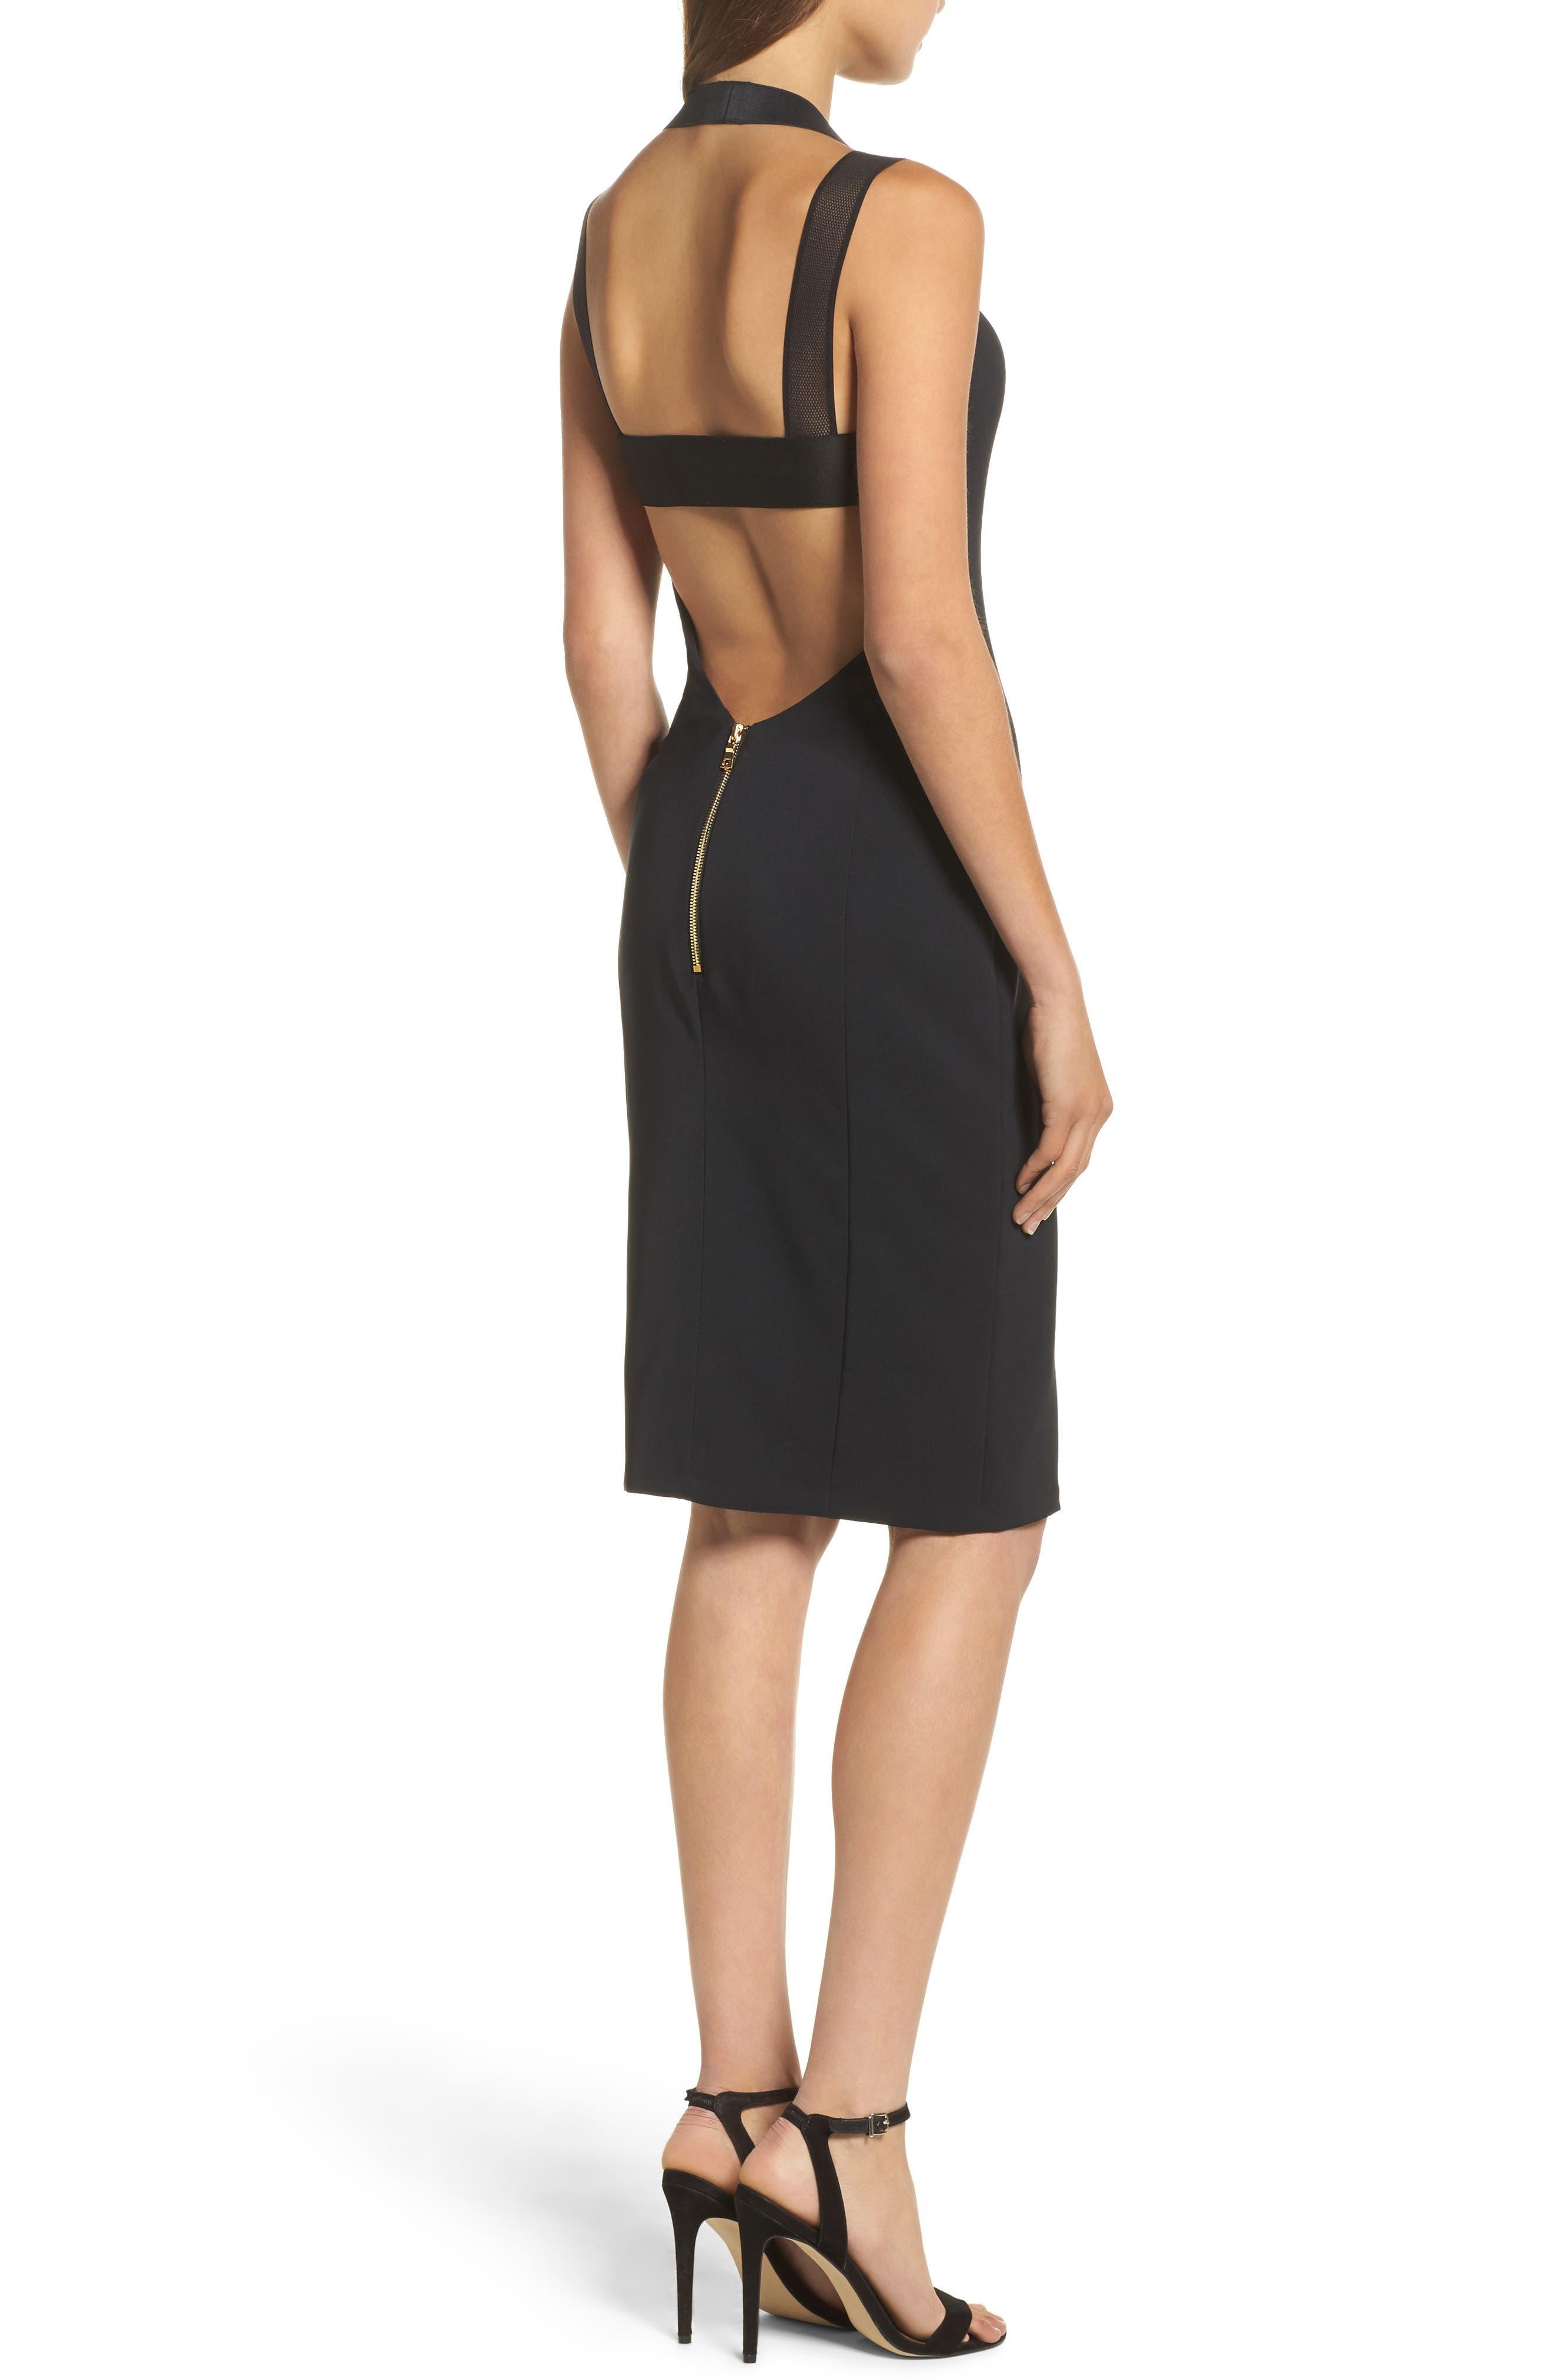 Kendra Elastic Strap Low Back Sheath Dress,                             Alternate thumbnail 2, color,